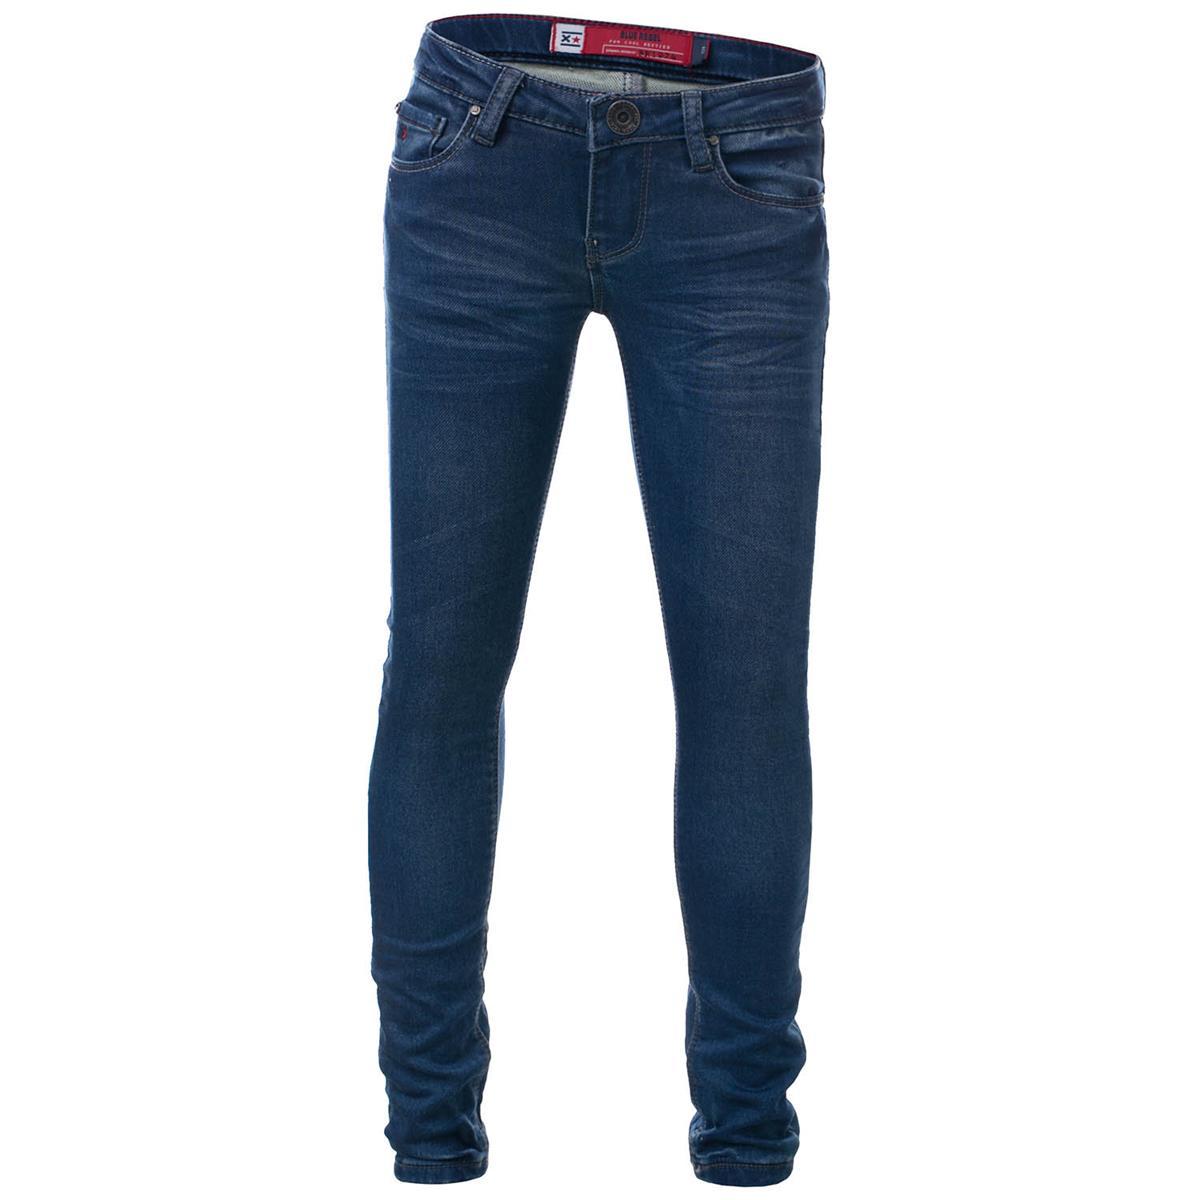 47dc705a93 Blue Rebel CASTLE - Civil Wash - ultra skinny fit jeans - betties. Zoom